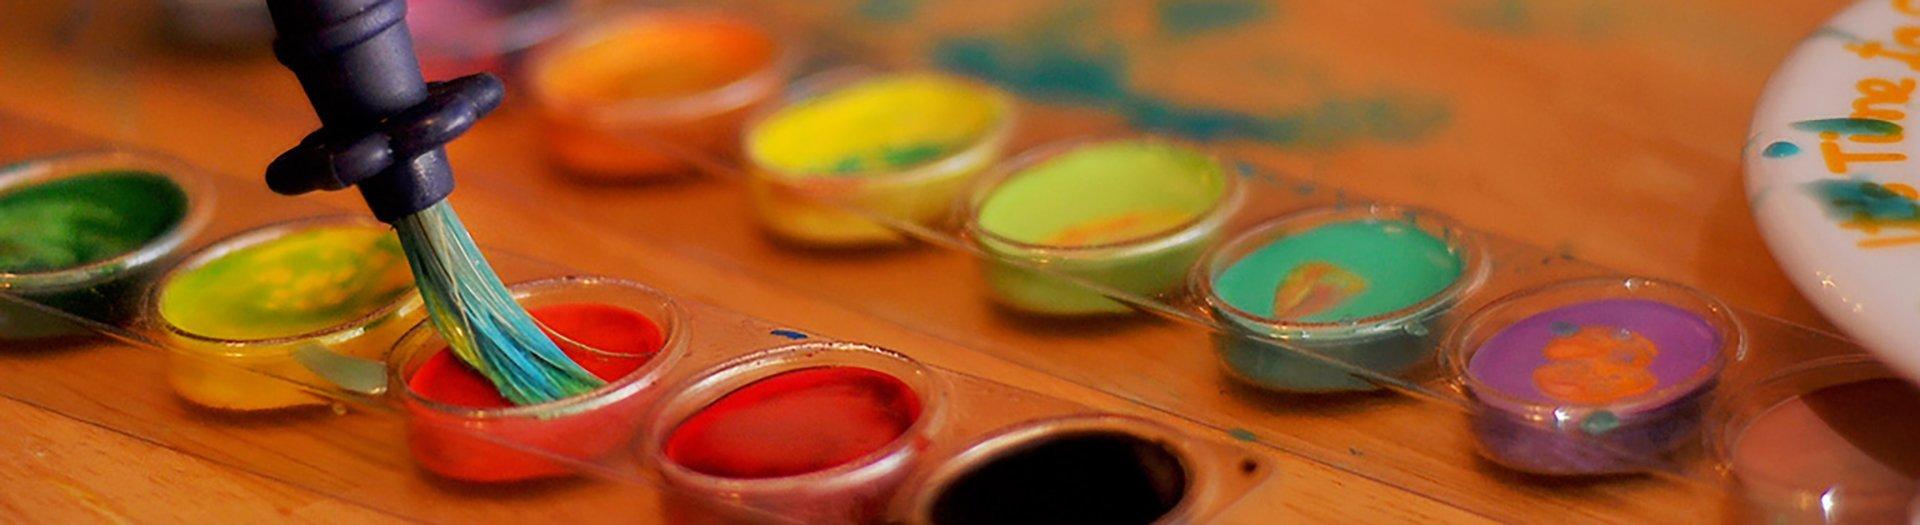 maleri-kunst-noergaards-hoejskole-begynder-palet-oliemaleri-tegning-qrouqis-farver-staffeli-akvaral-vandfarver-kul